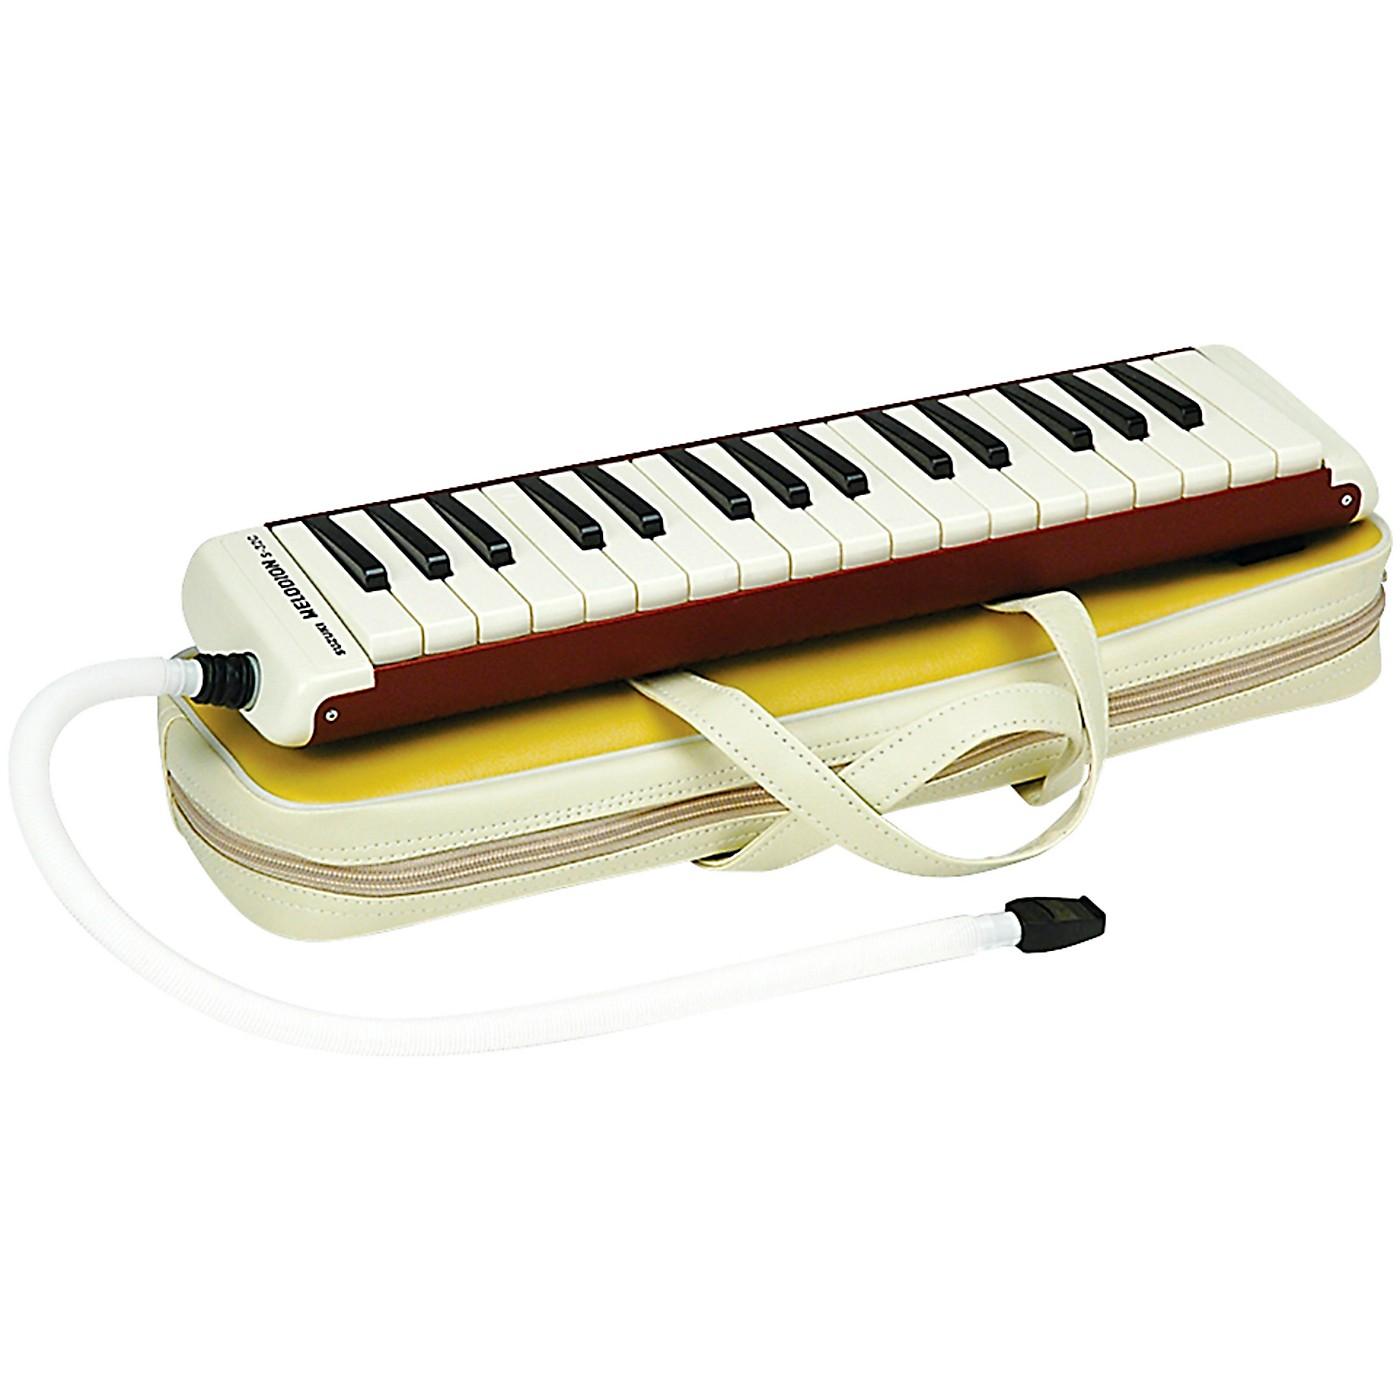 Suzuki Soprano Melodion with Case & Mouthpiece thumbnail